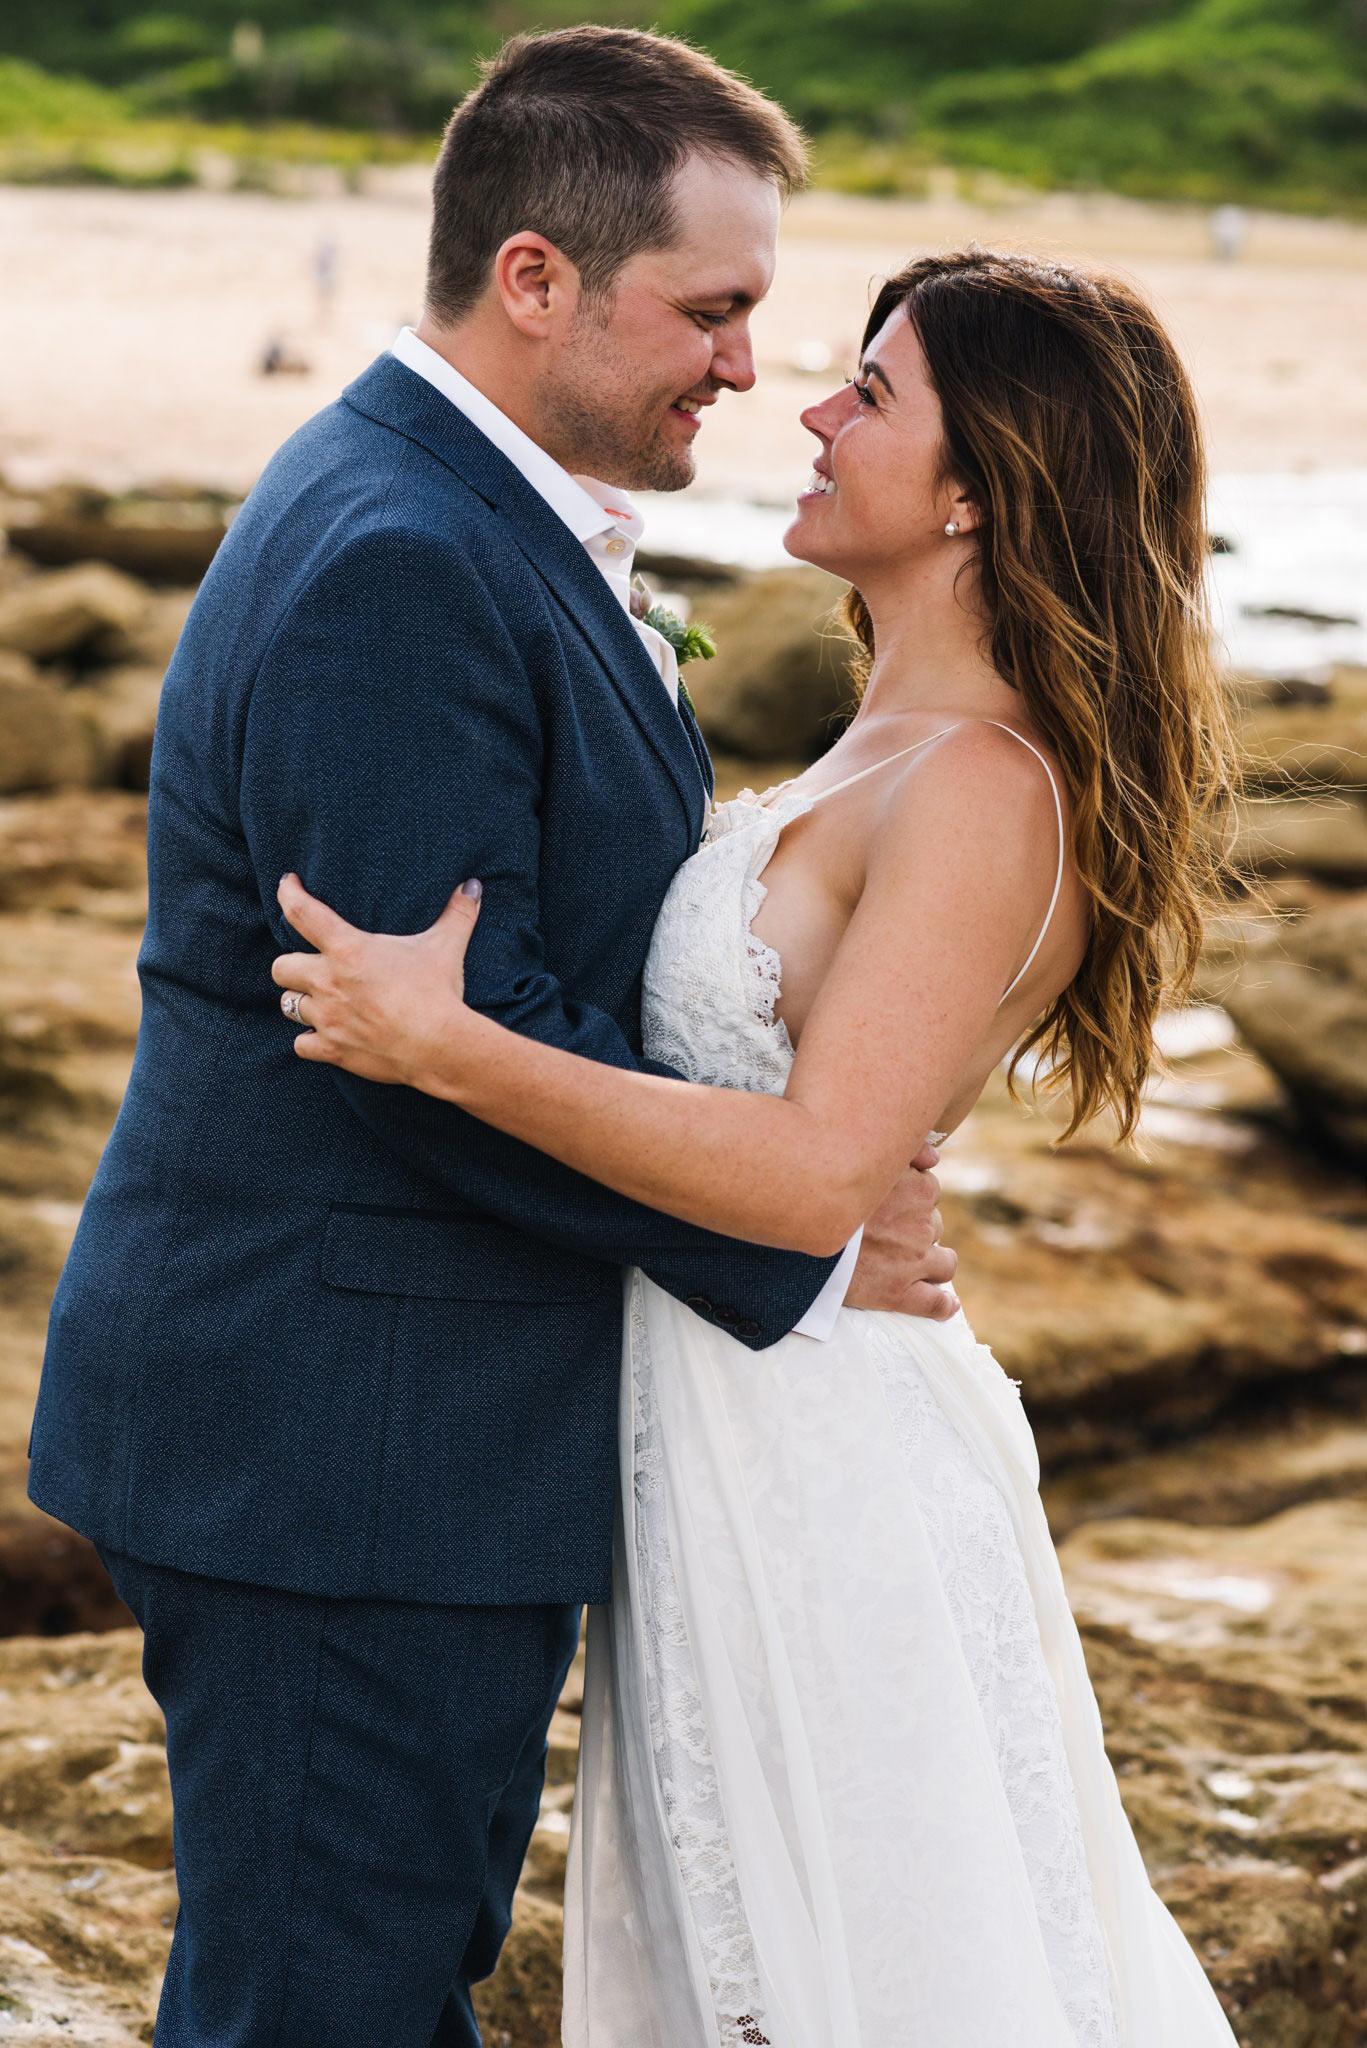 Bride and groom embrace on Sydney beach